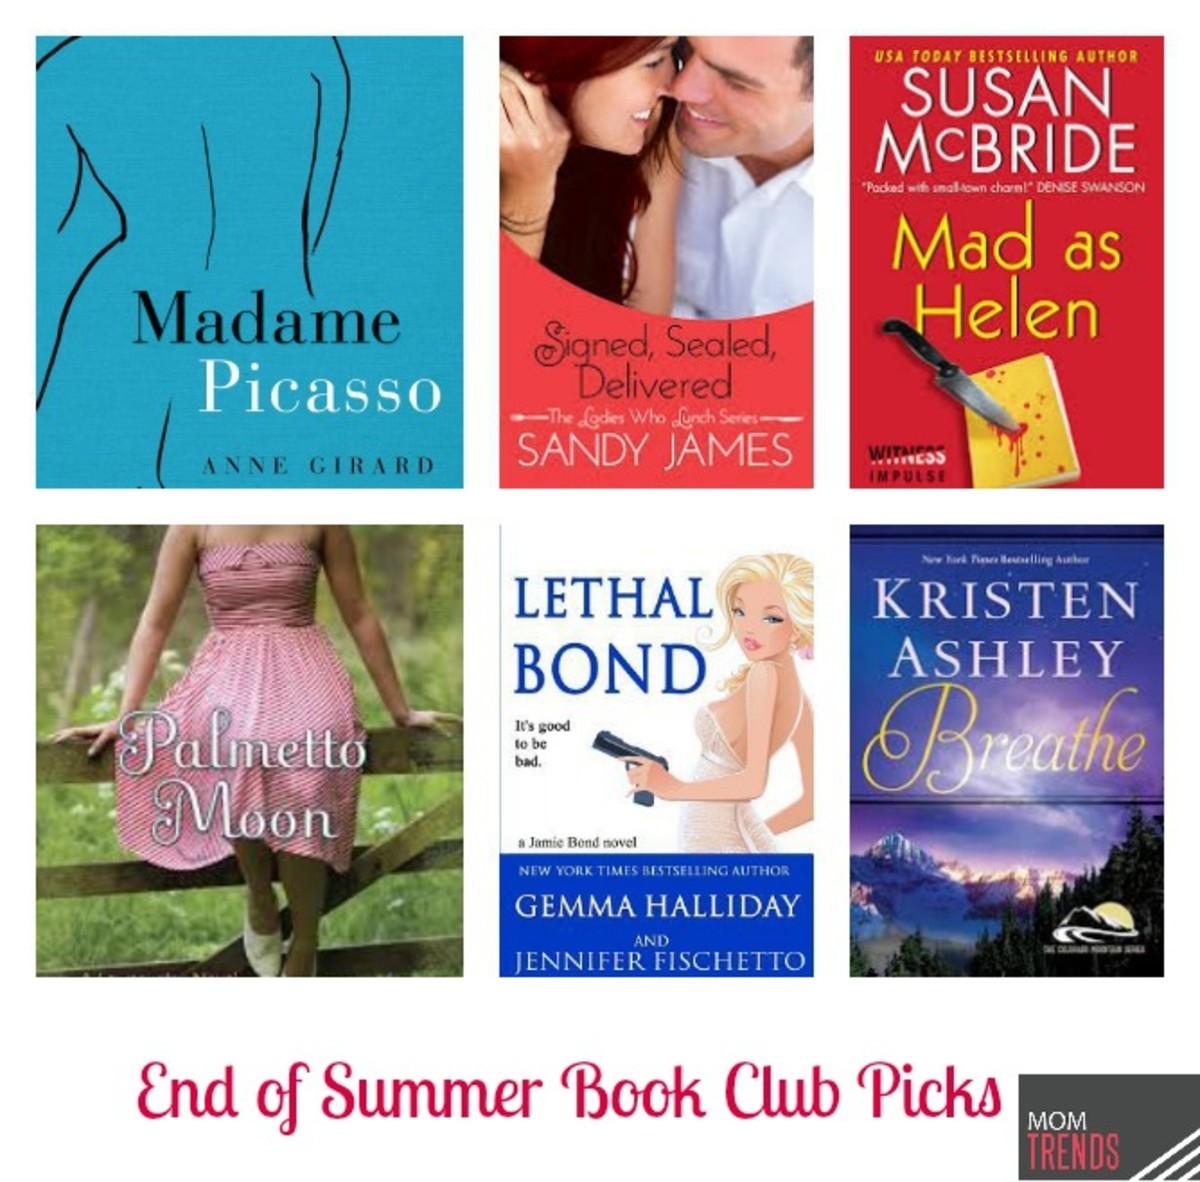 End of Summer Book Club Picks